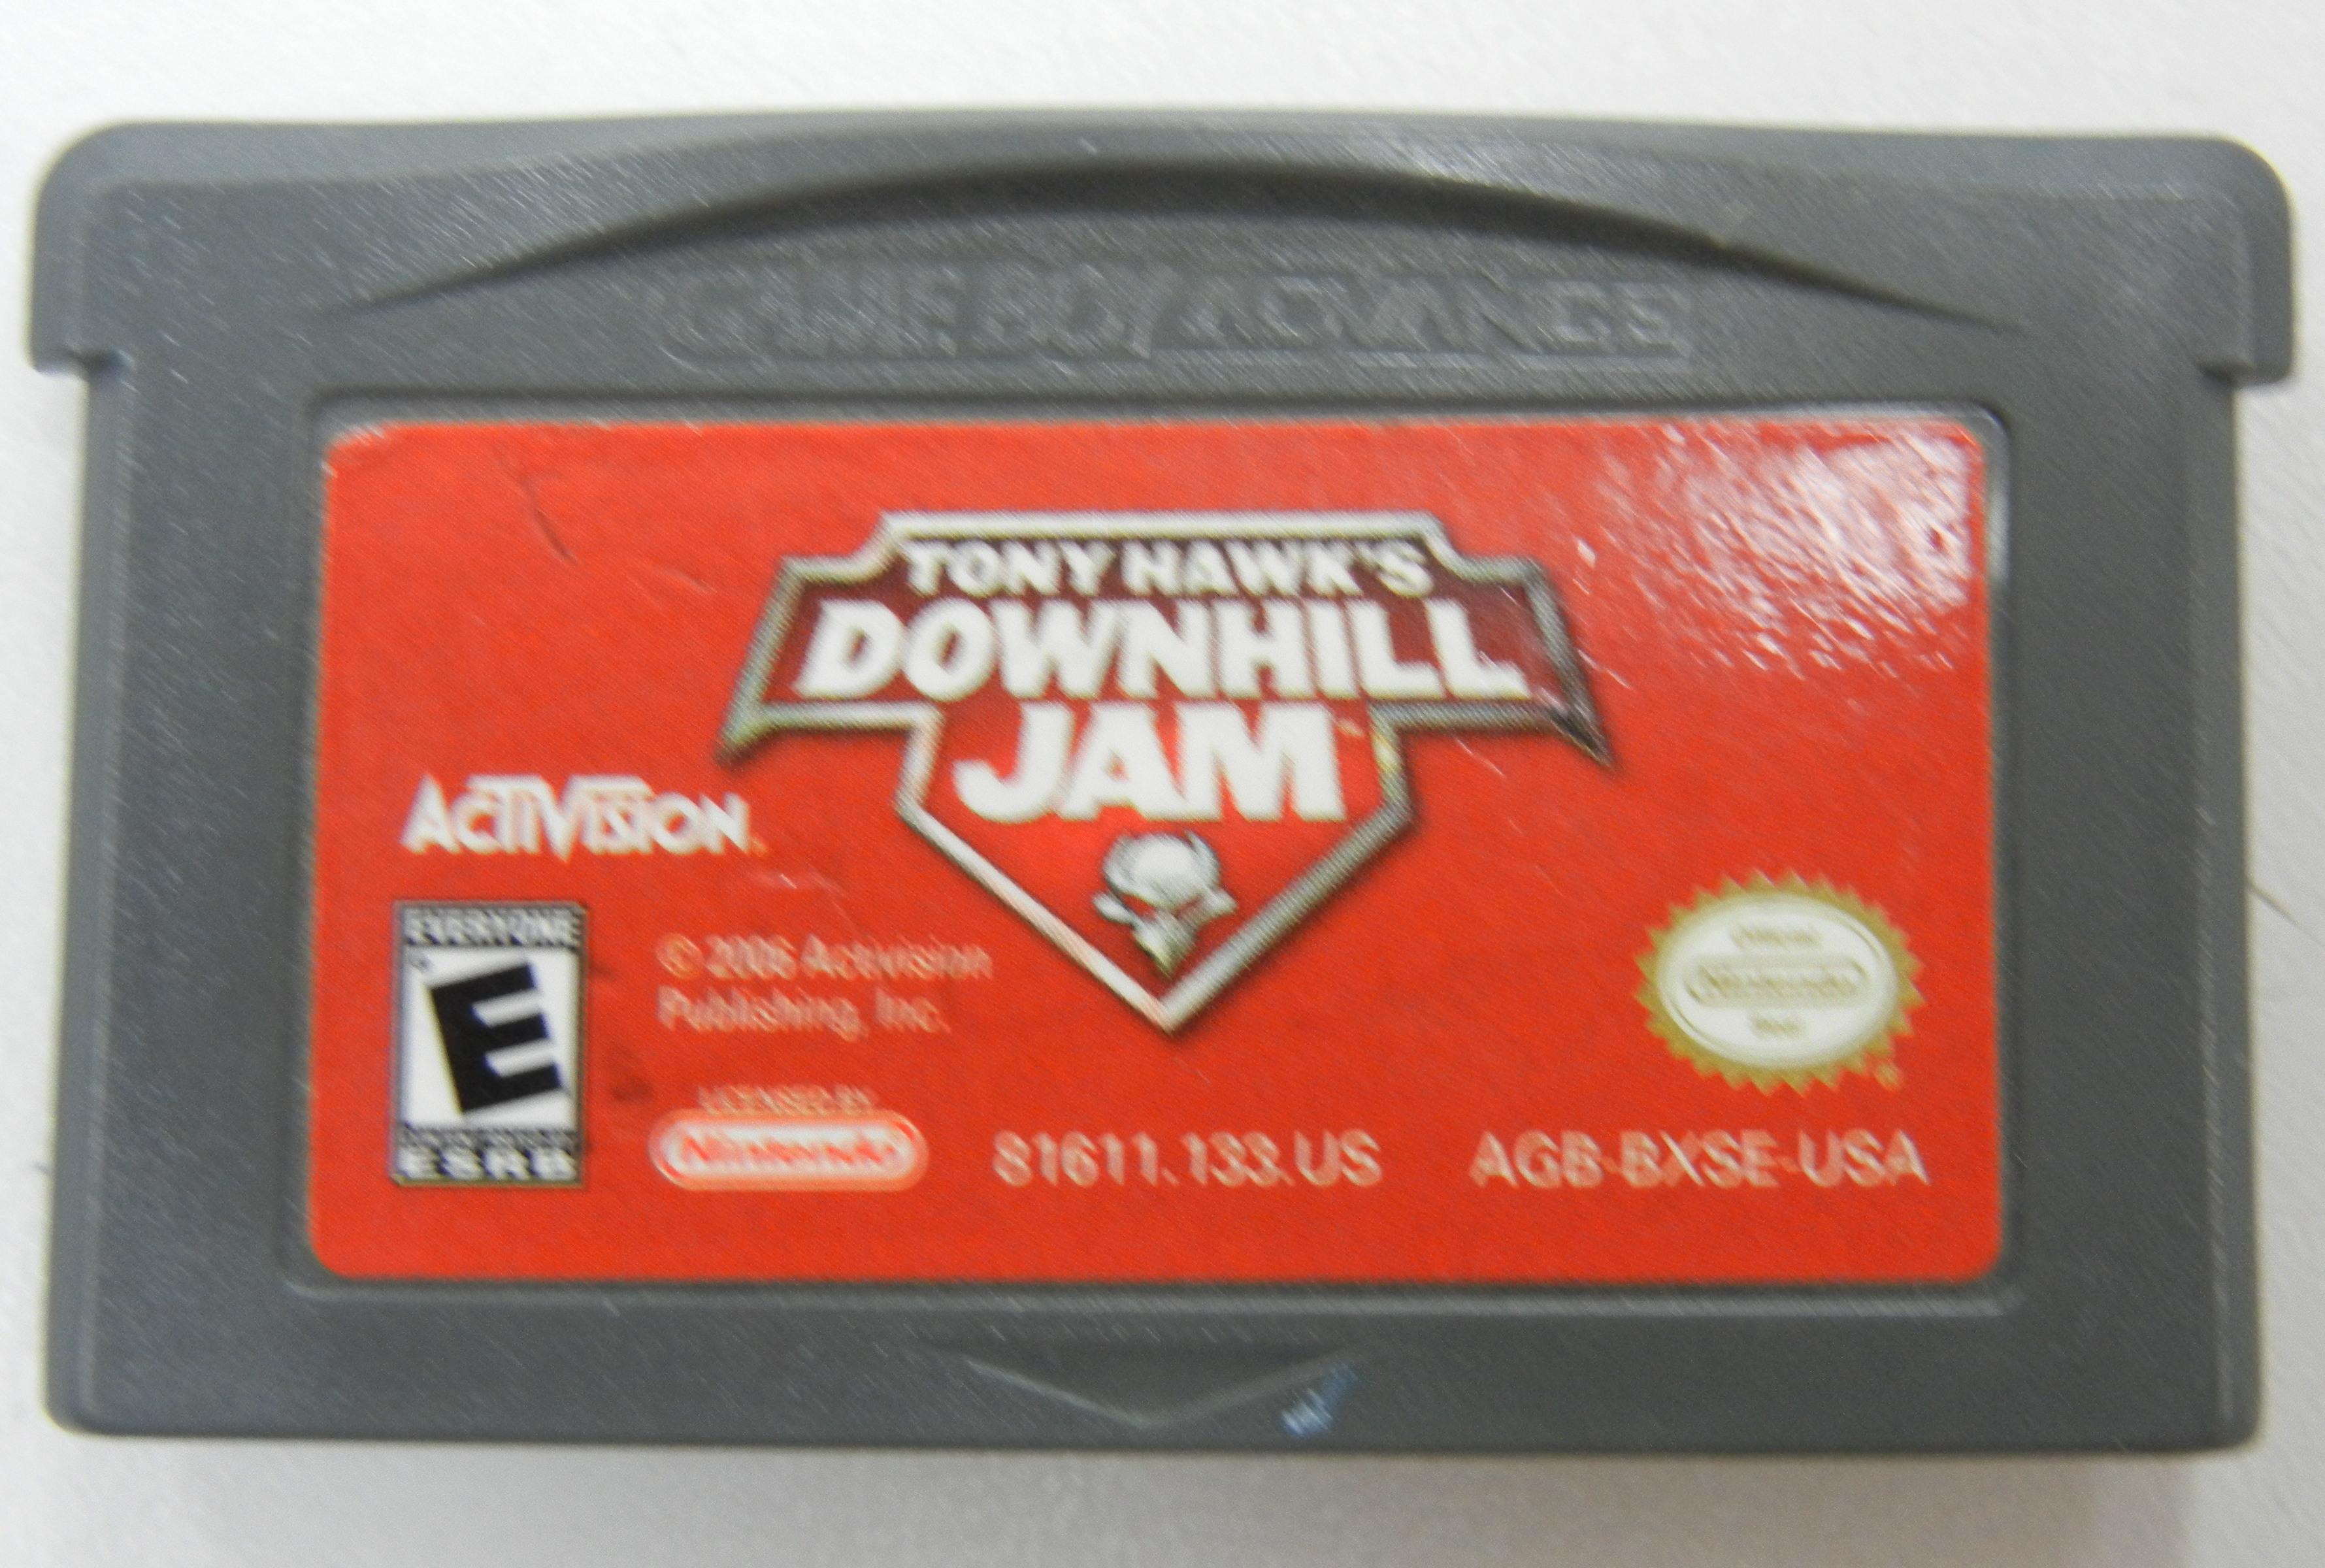 TONY HAWK'S DOWNHILL JAM - GAMEBOY ADVANCE GAME